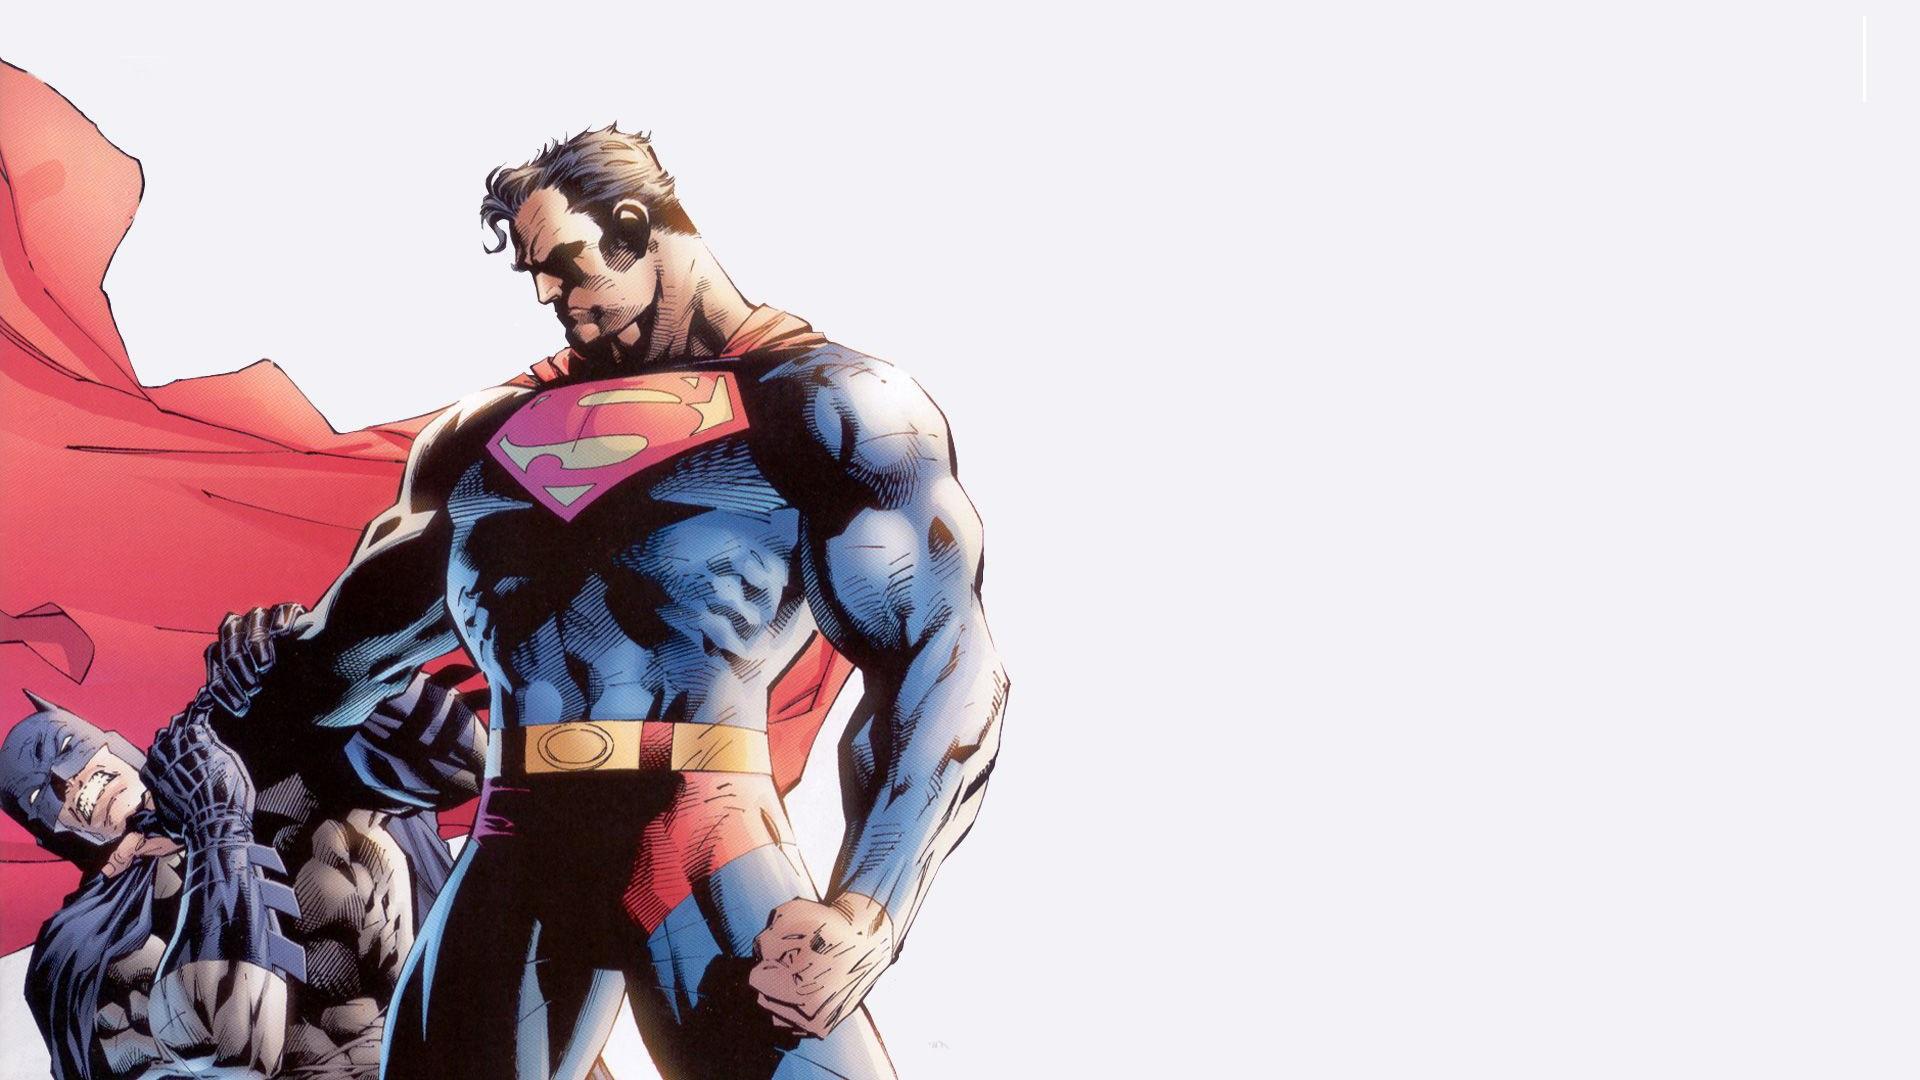 6 Batman Vs Superman Hd Wallpapers Backgrounds